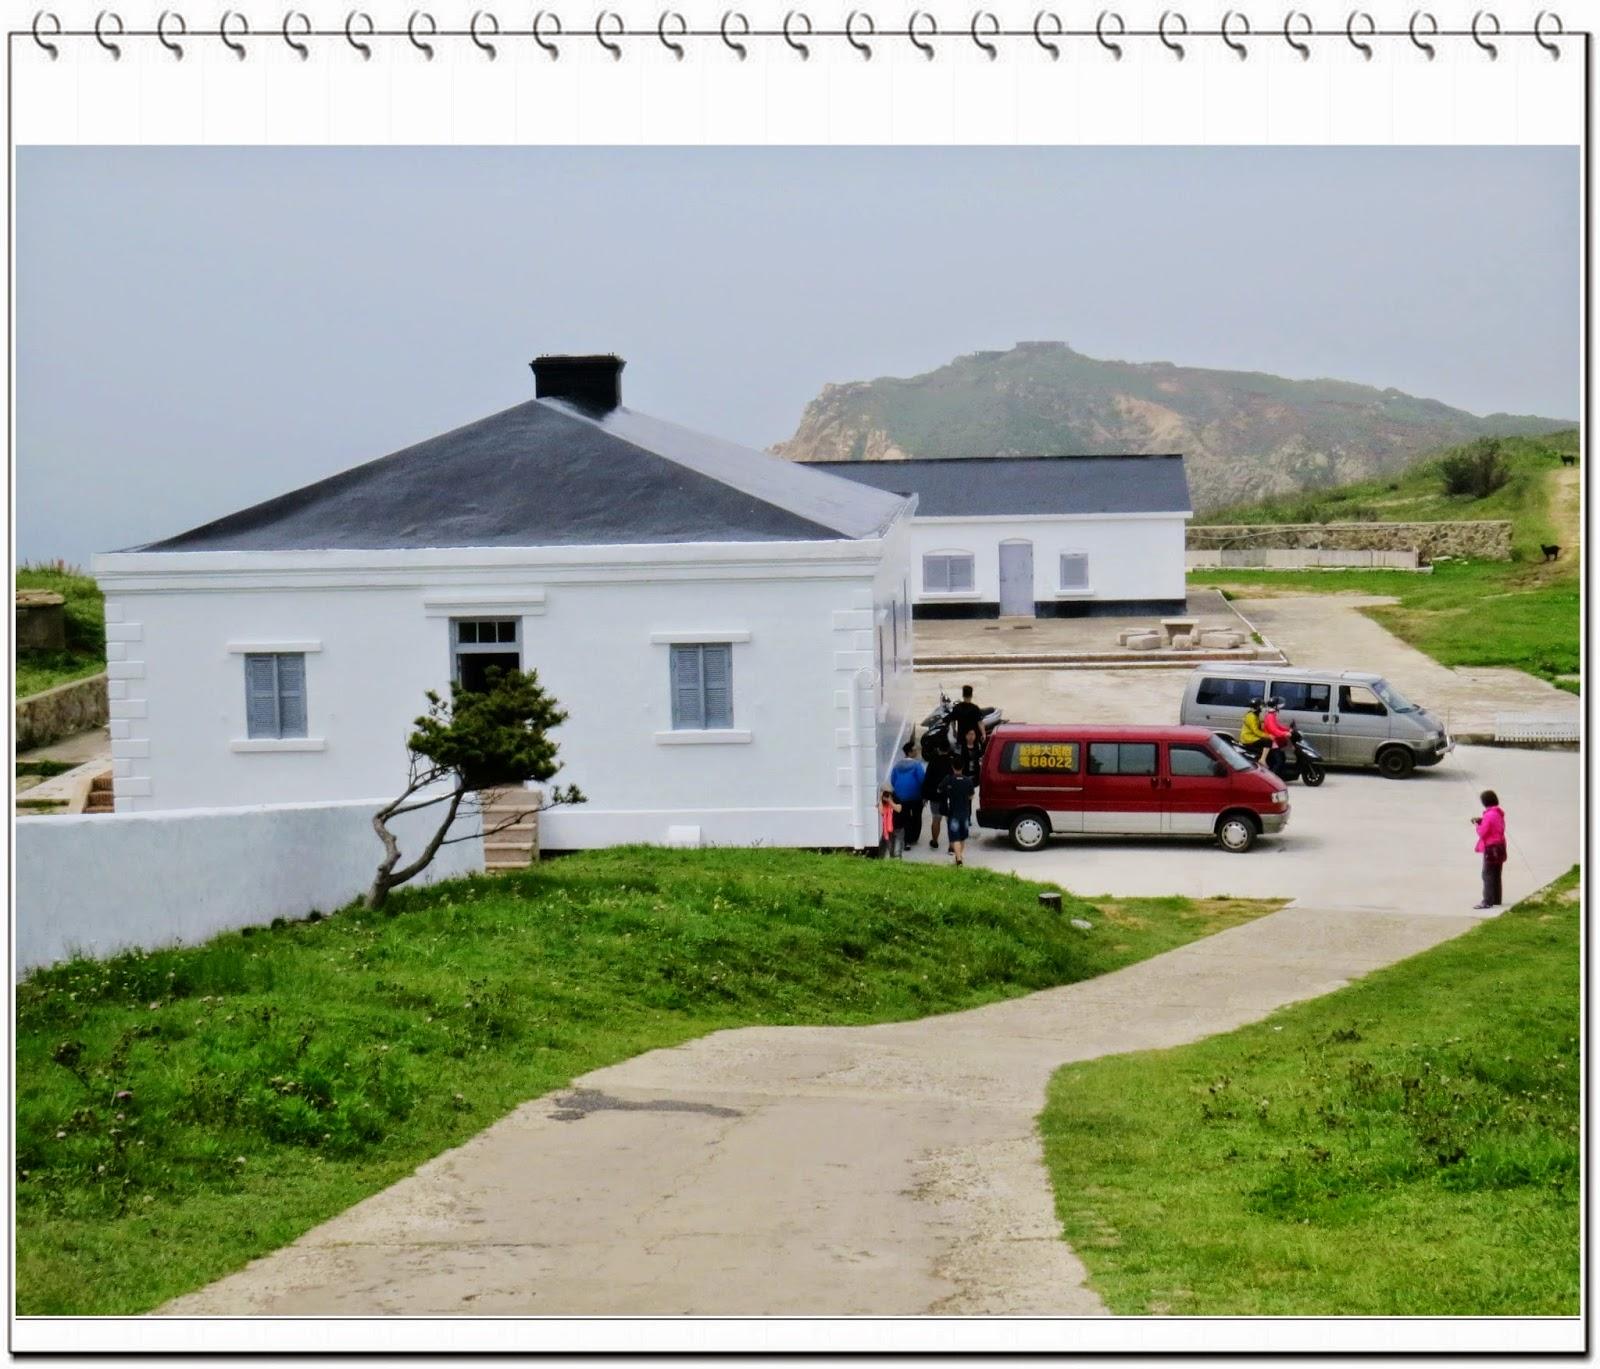 lifebaby-home: 2014-05-25馬祖行(第五天上半天東莒之二)